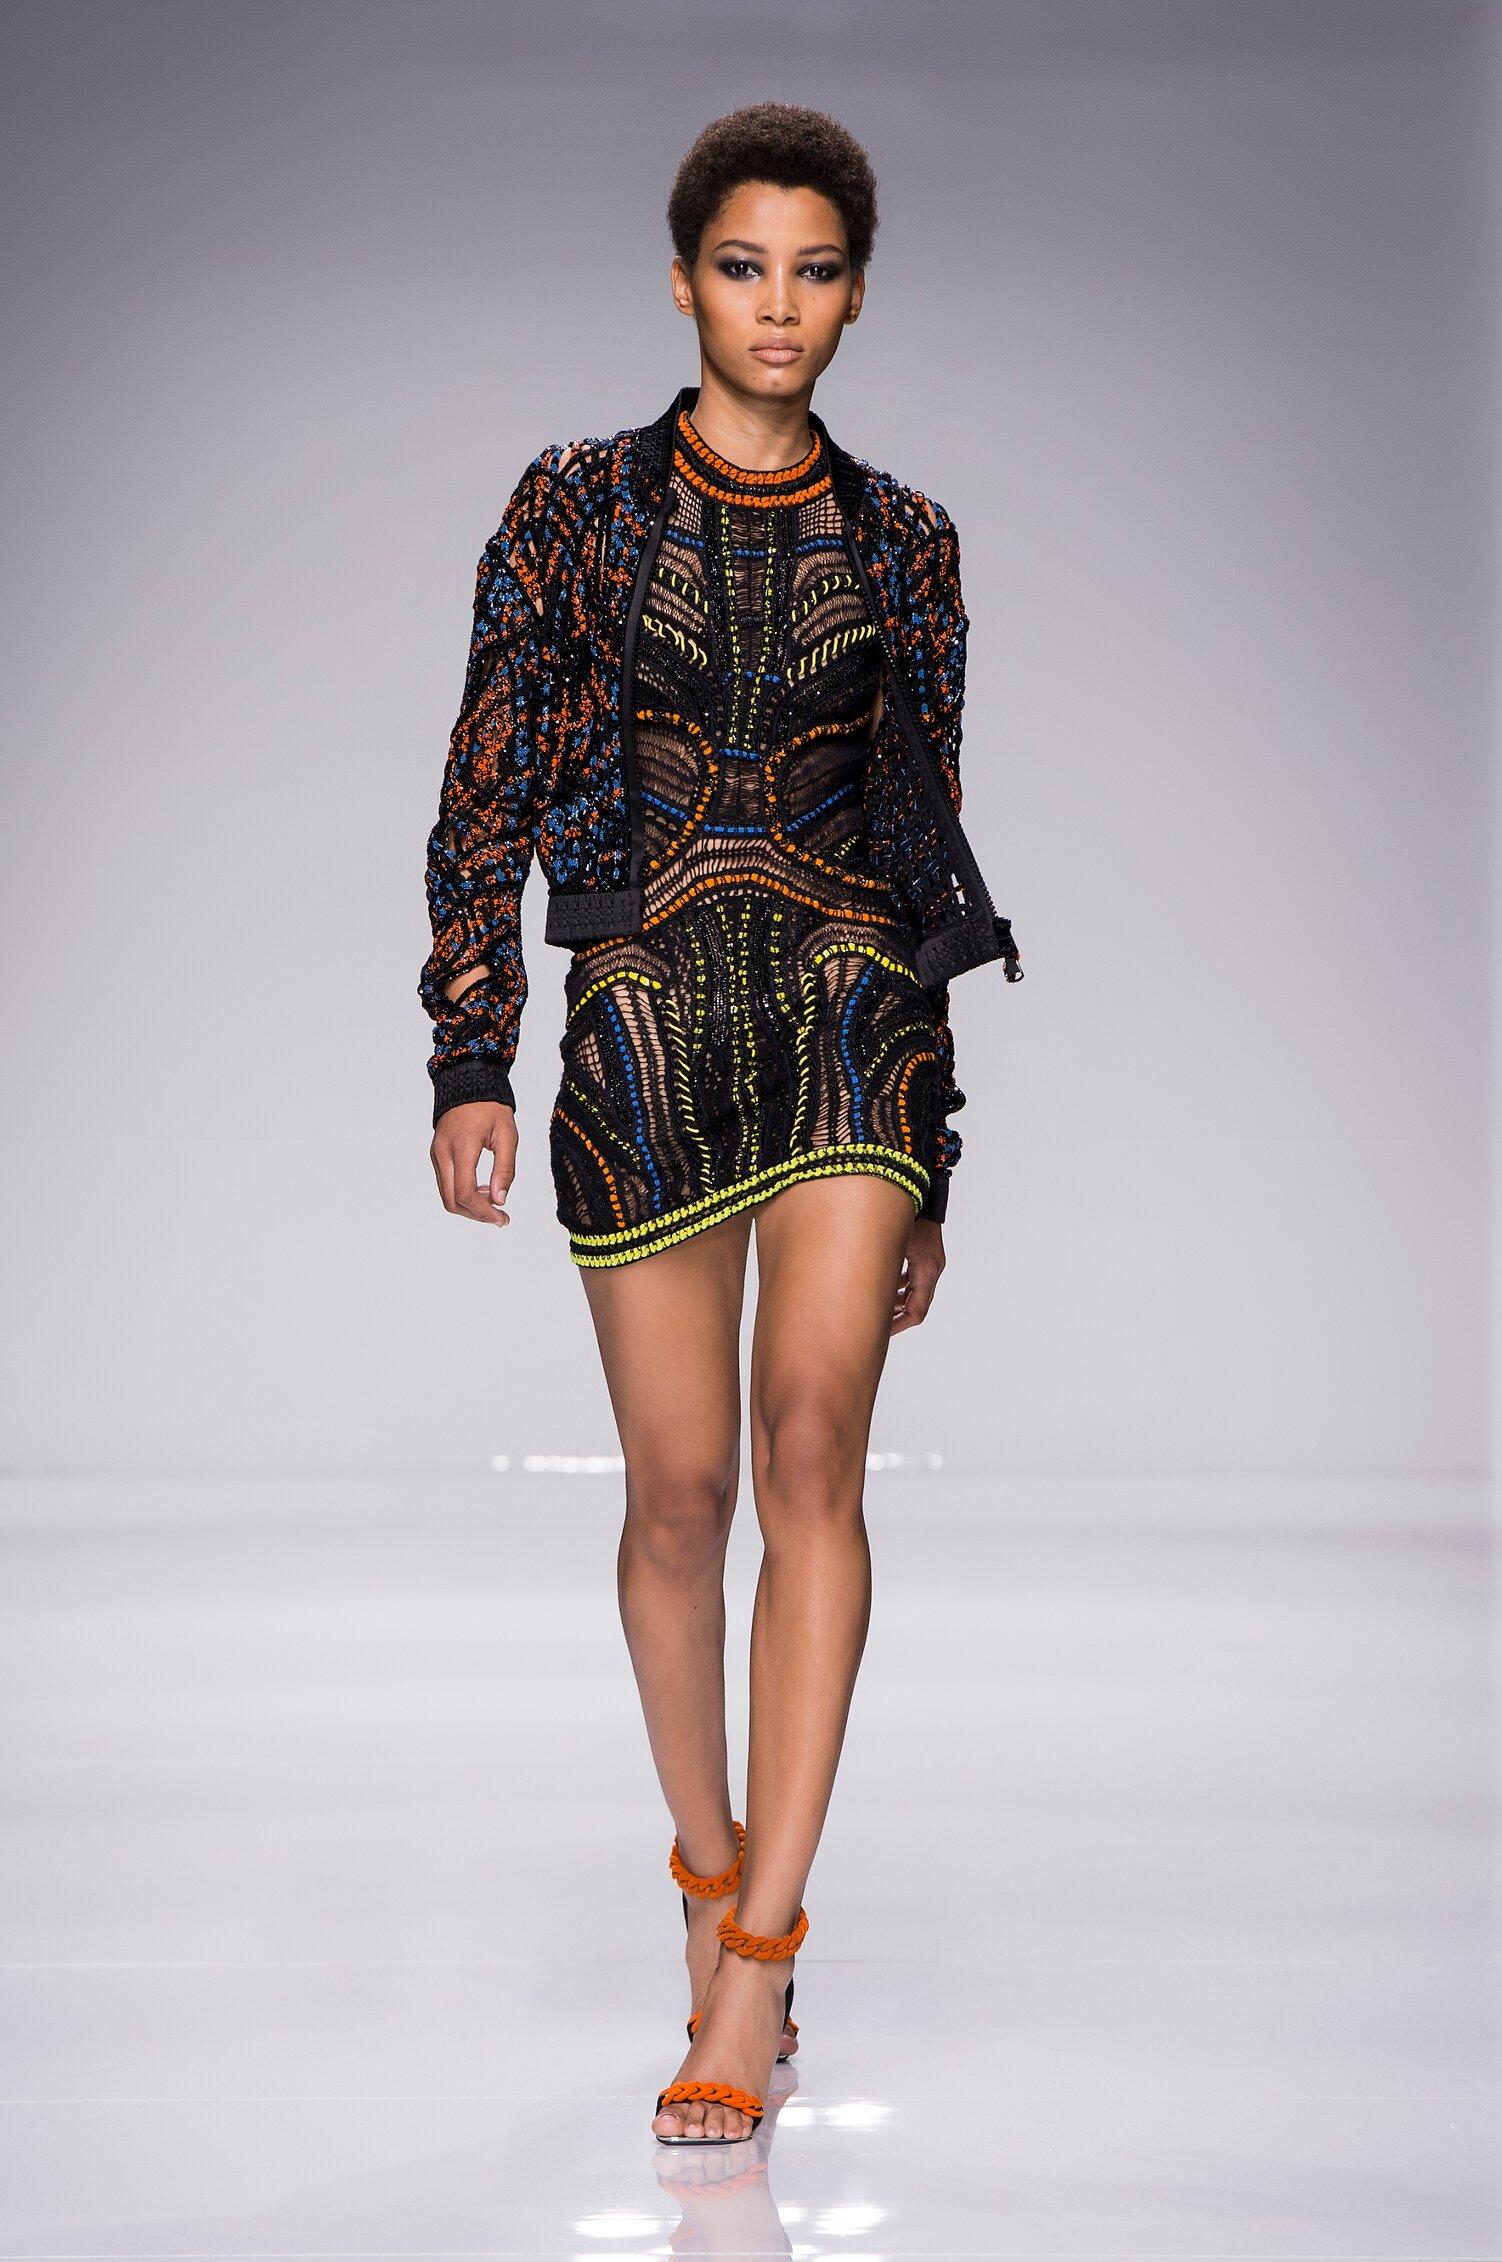 Atelier Versace Couture Summer 2016 Catwalk